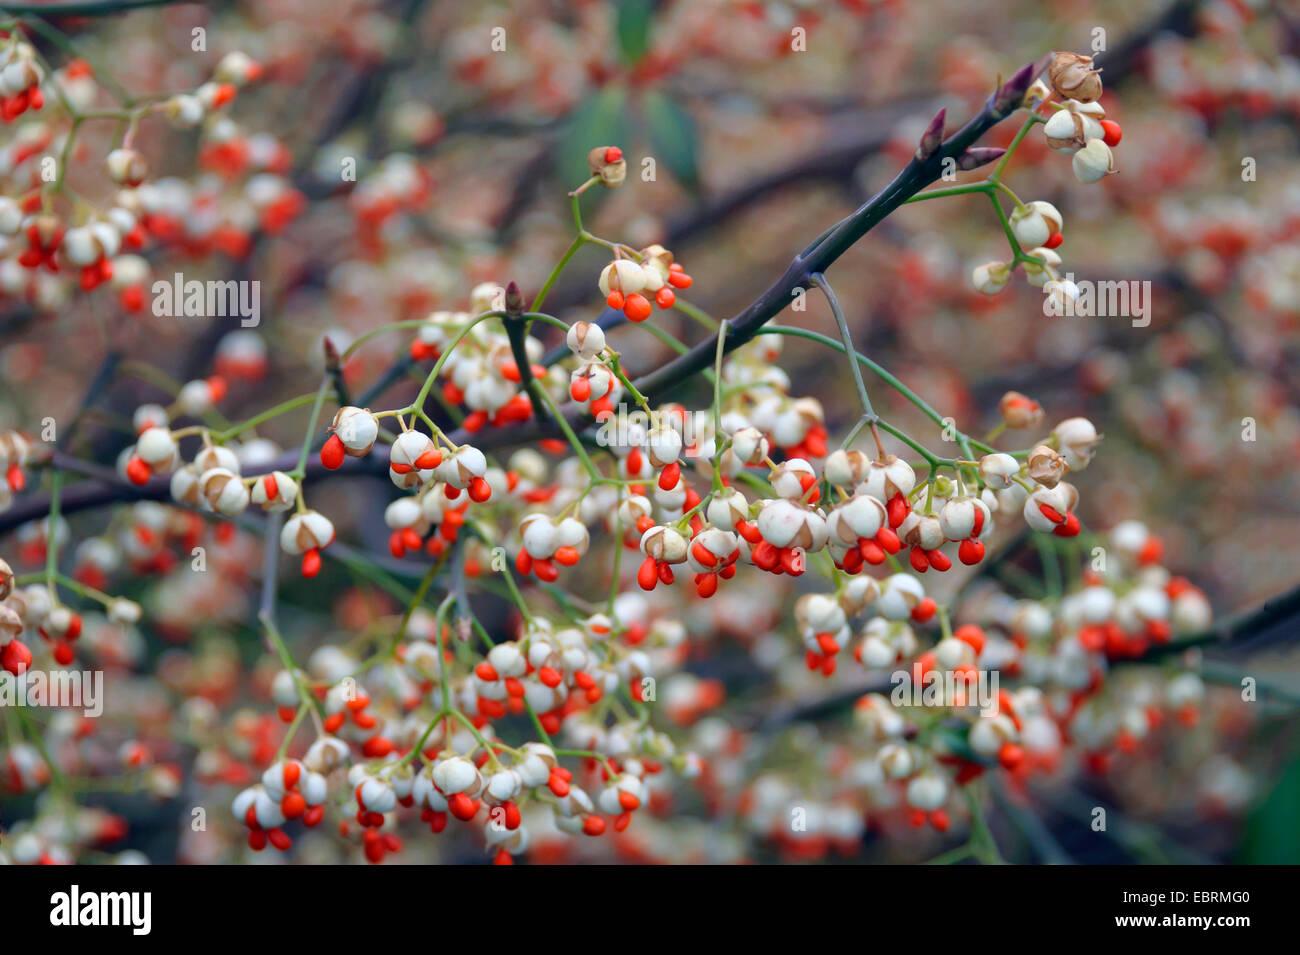 climbing euonymus, wintercreeper euonymus, winter-creeper (Euonymus fortunei 'Vegetus', Euonymus fortunei - Stock Image